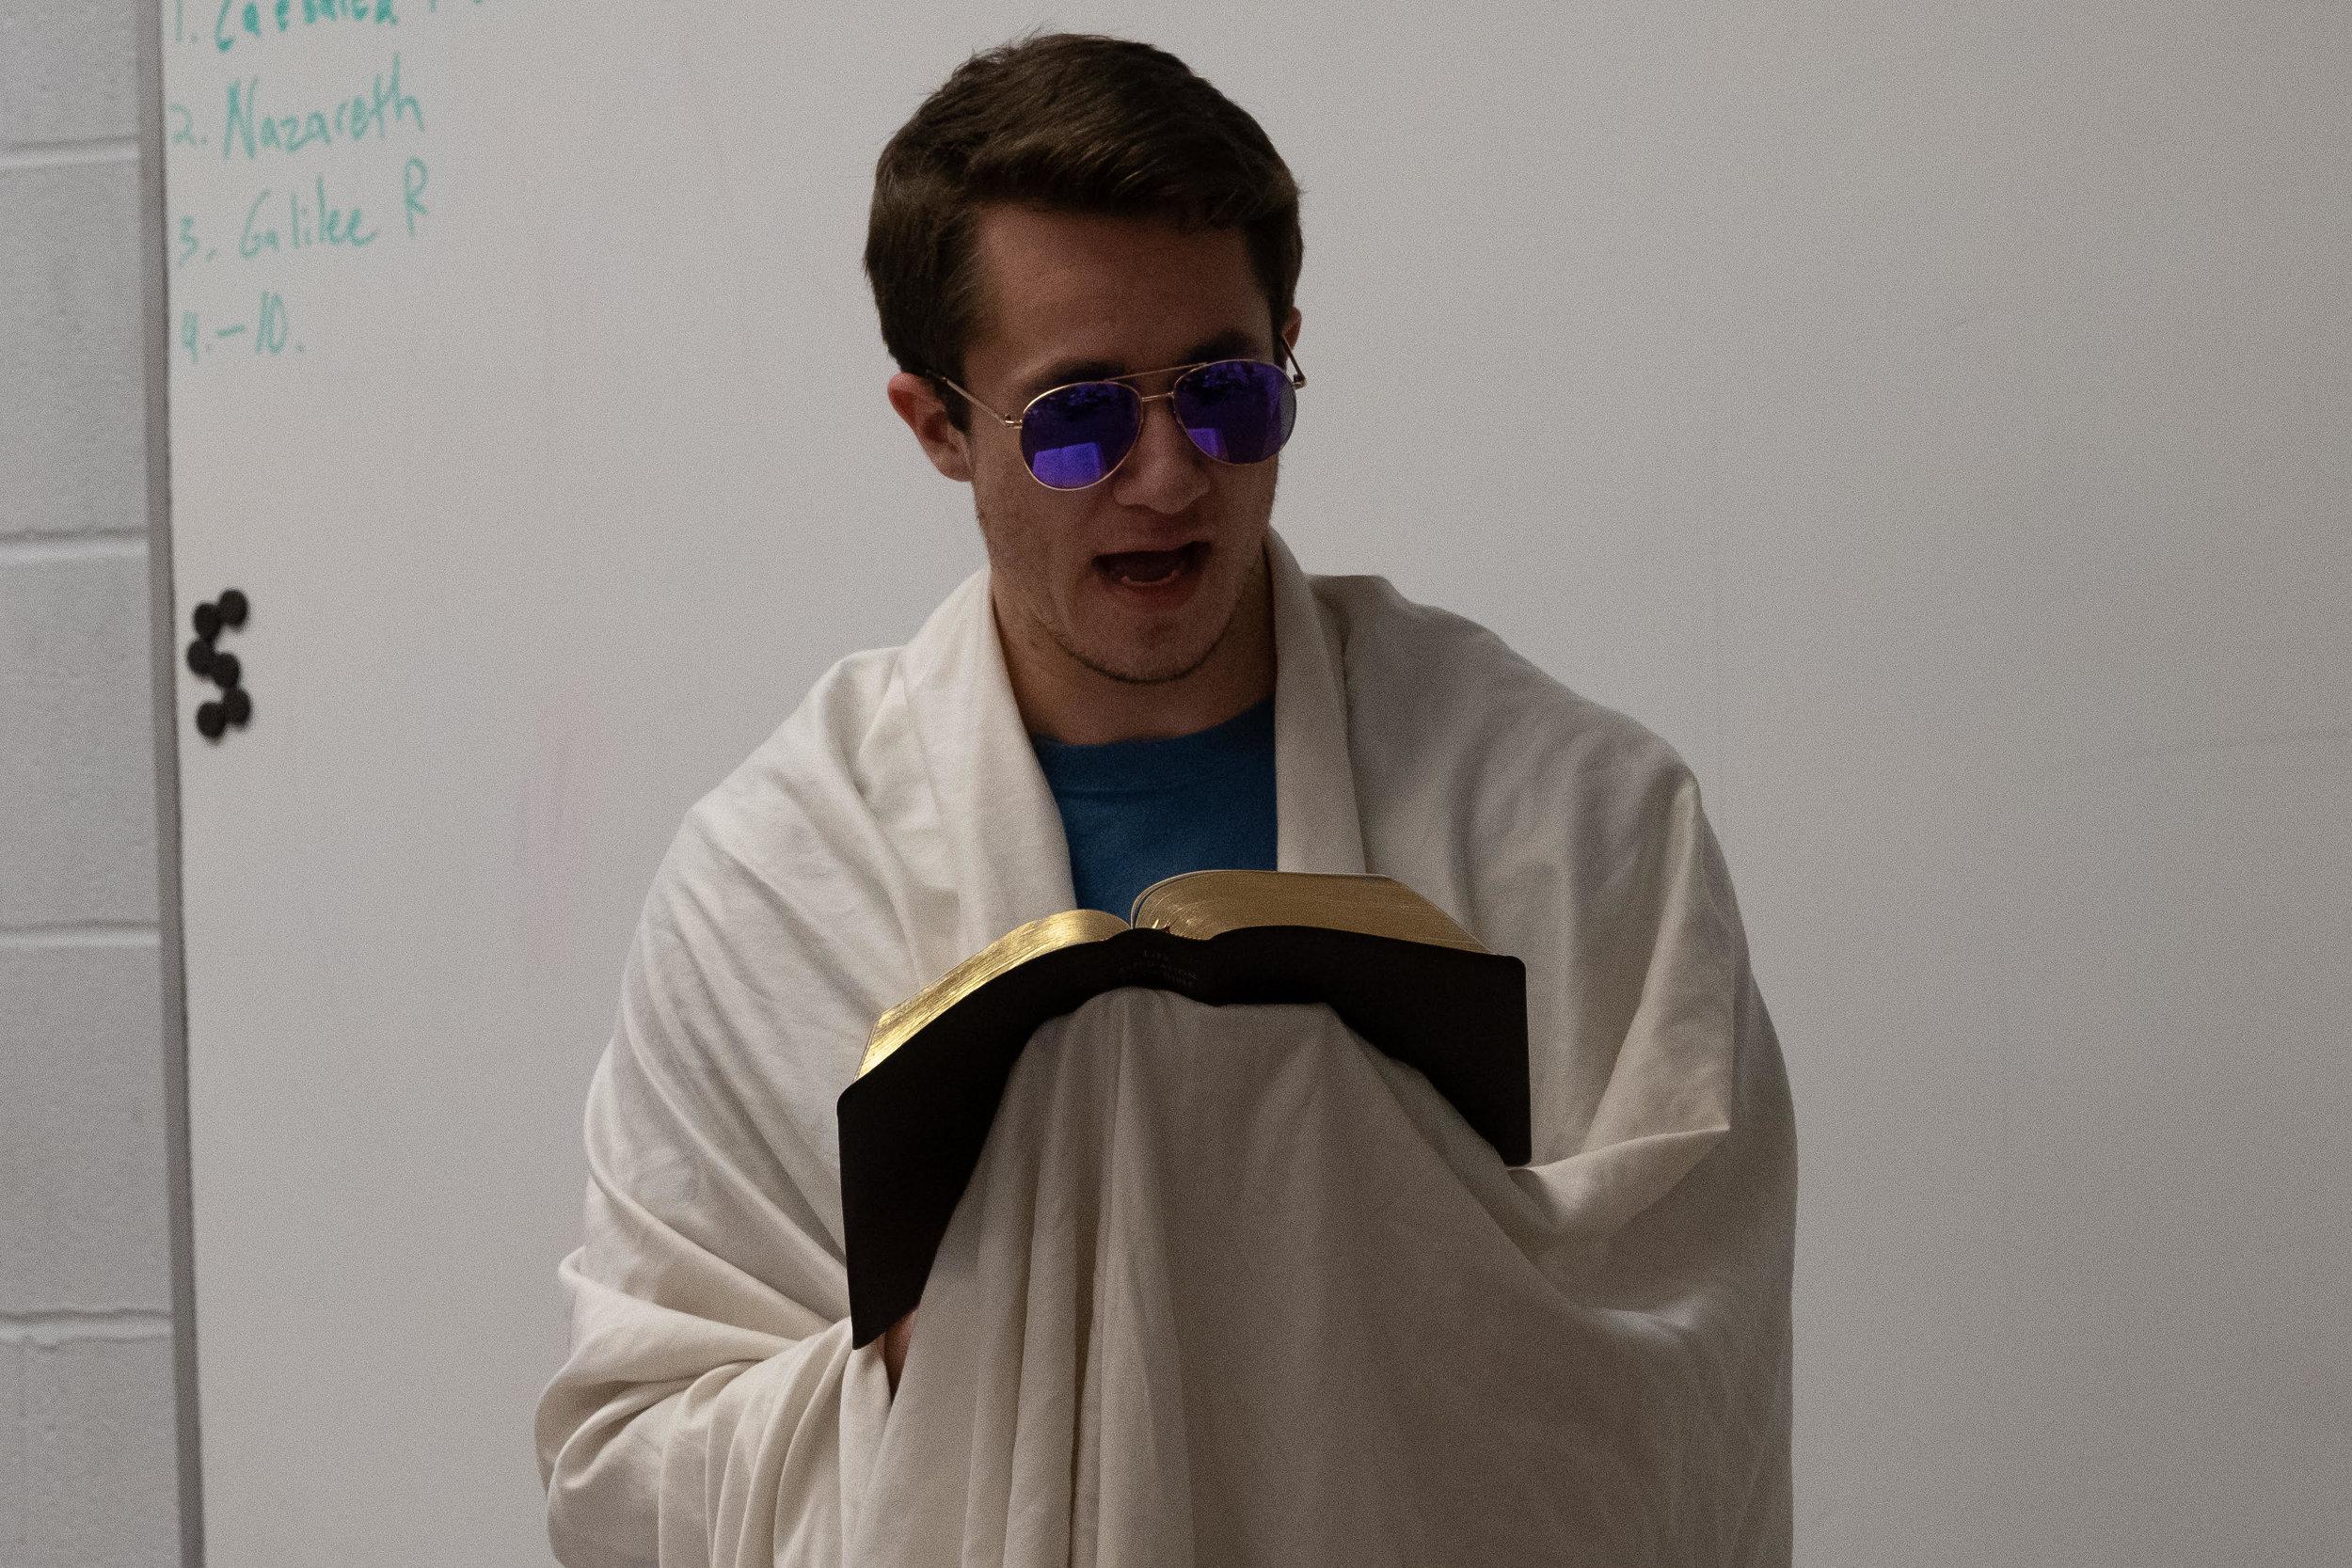 An angel narrator participating in the reenactment of Matthew 4.